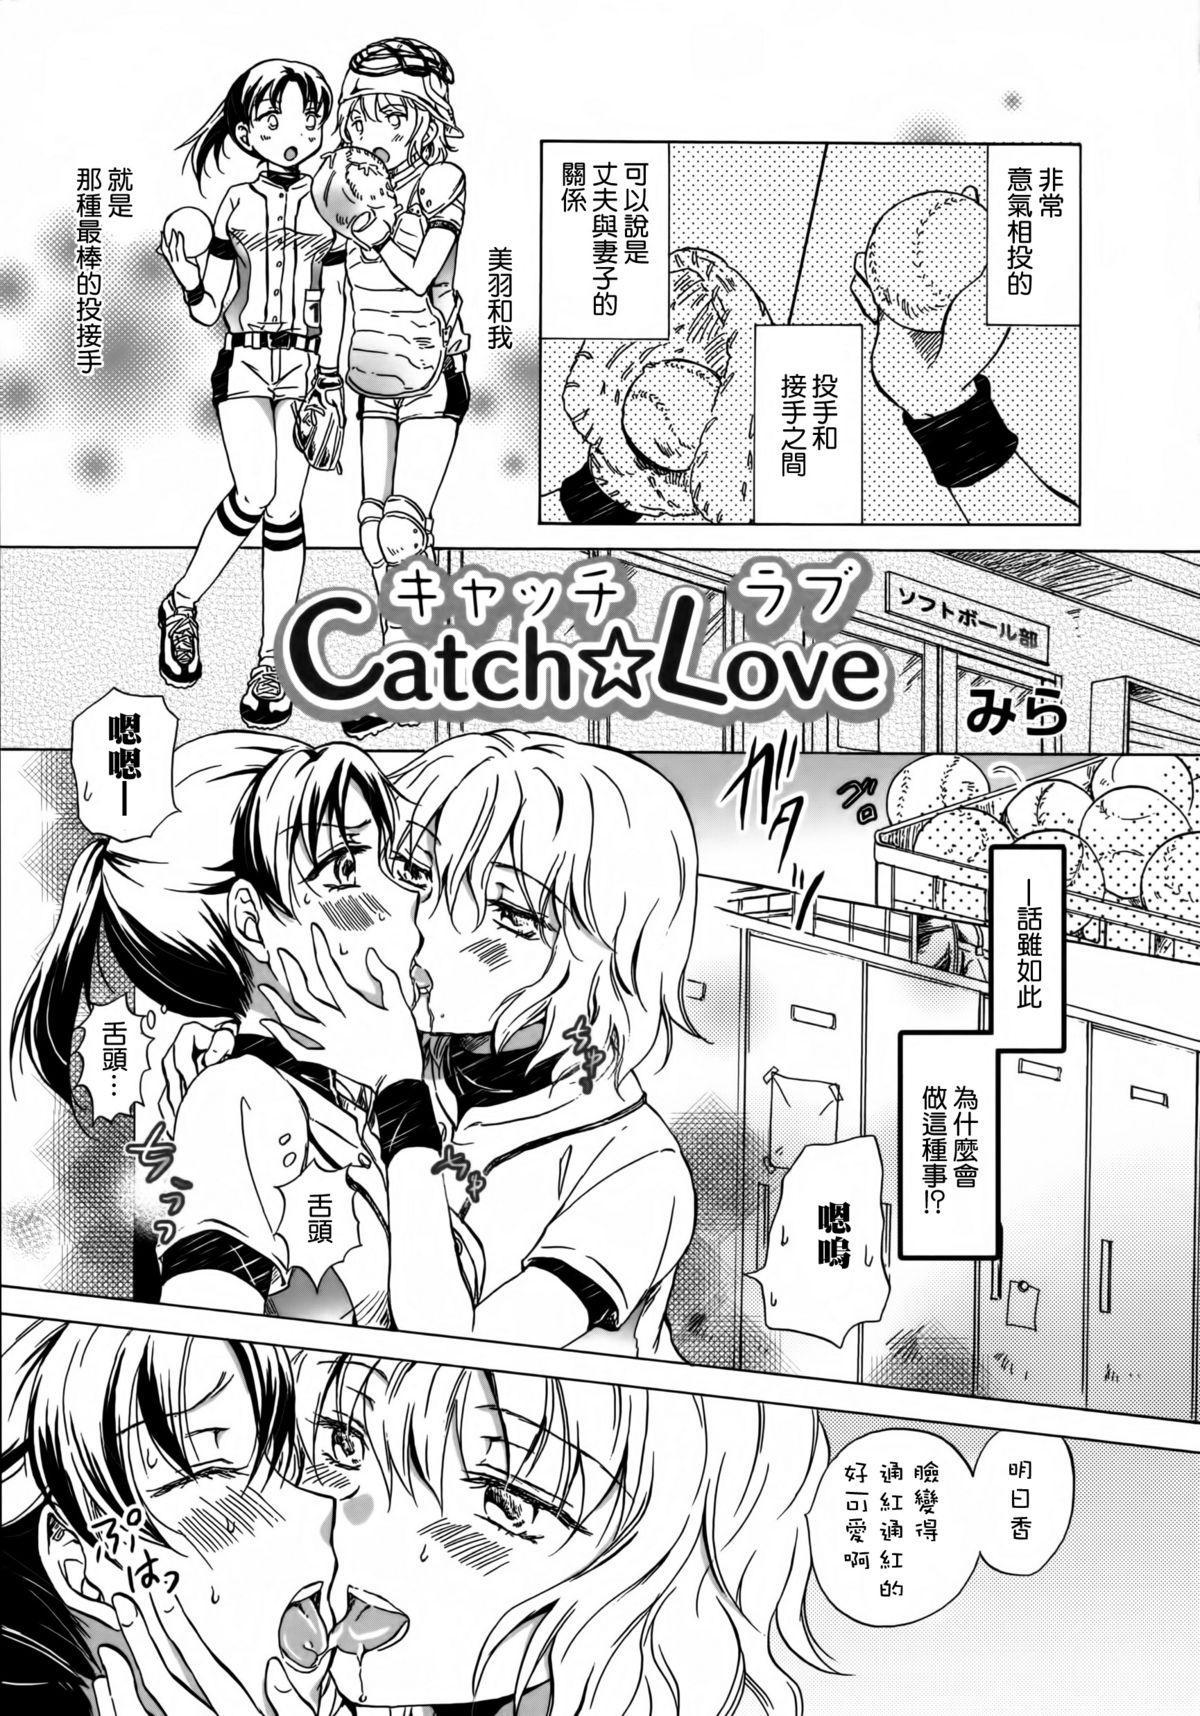 Catch Love 0